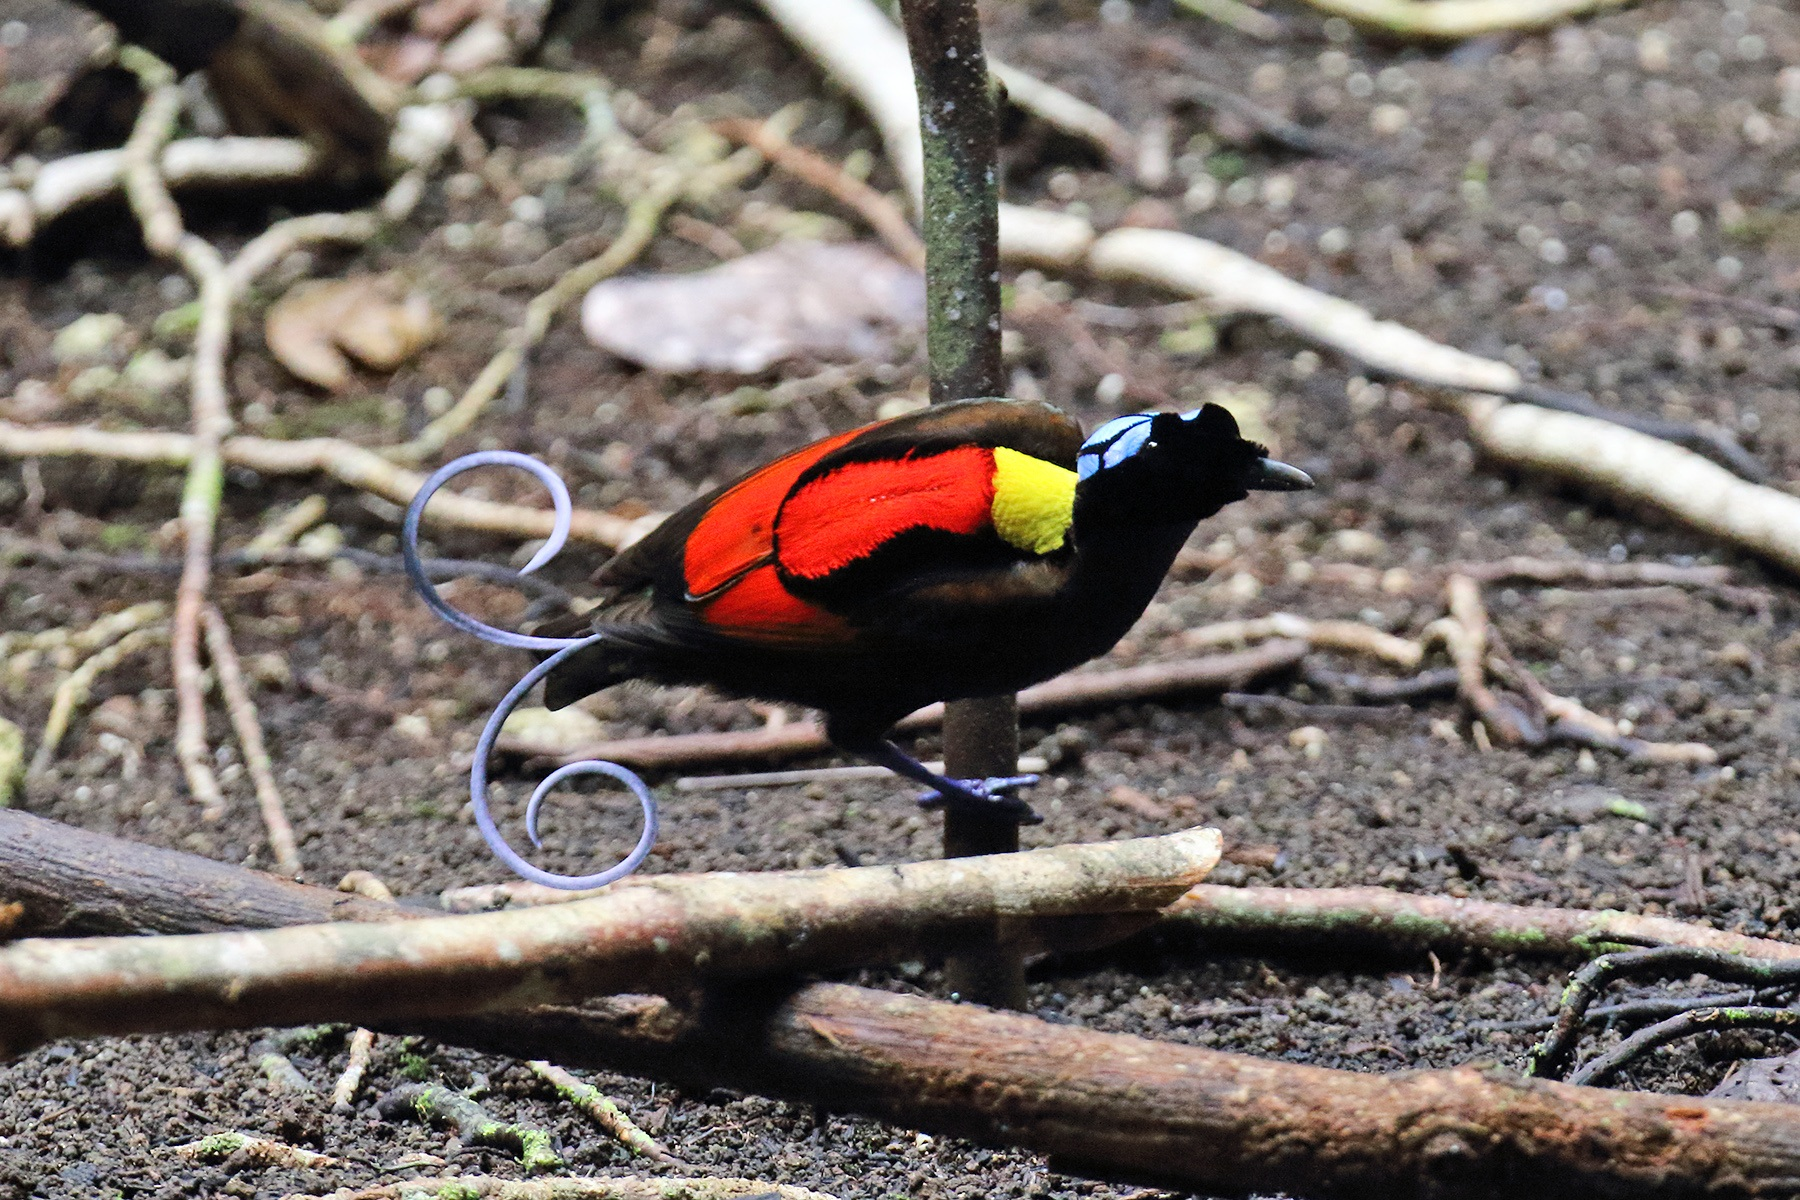 West Papua Birding Tours, Indonesia - Birdwatching Tours